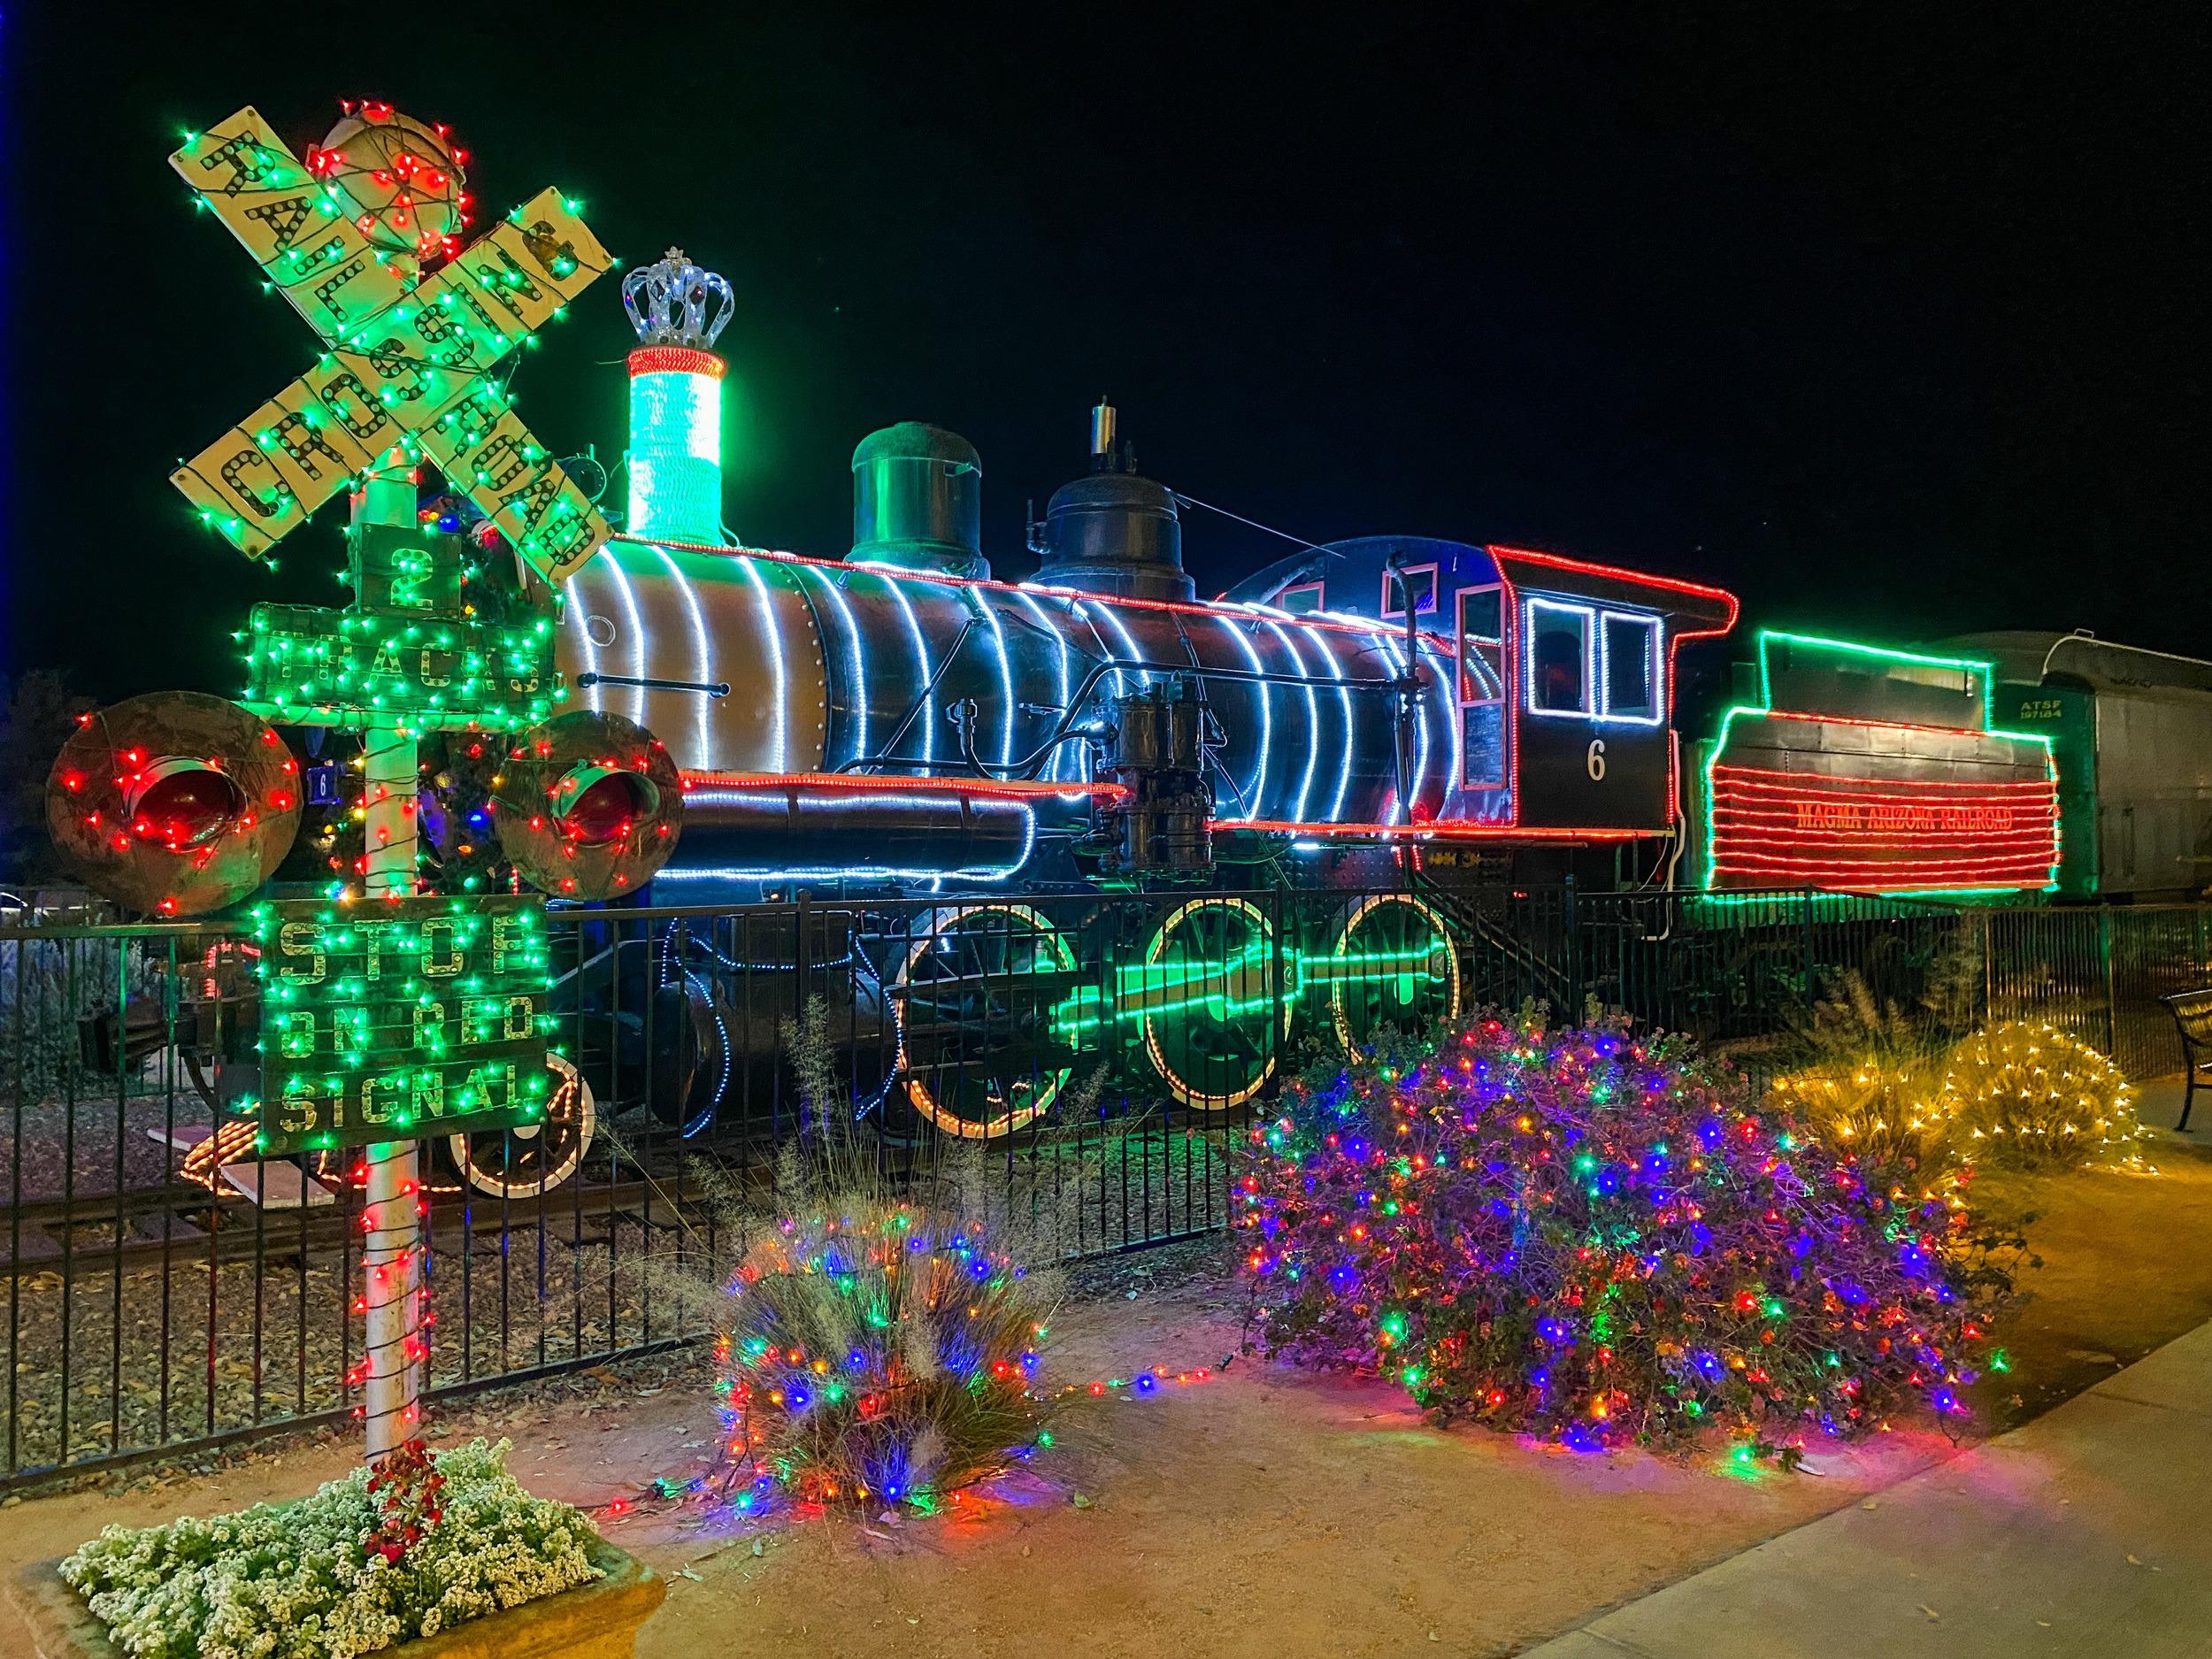 A decorated full-sized train at McCormick-Stillman Railroad Park in Scottsdale, AZ